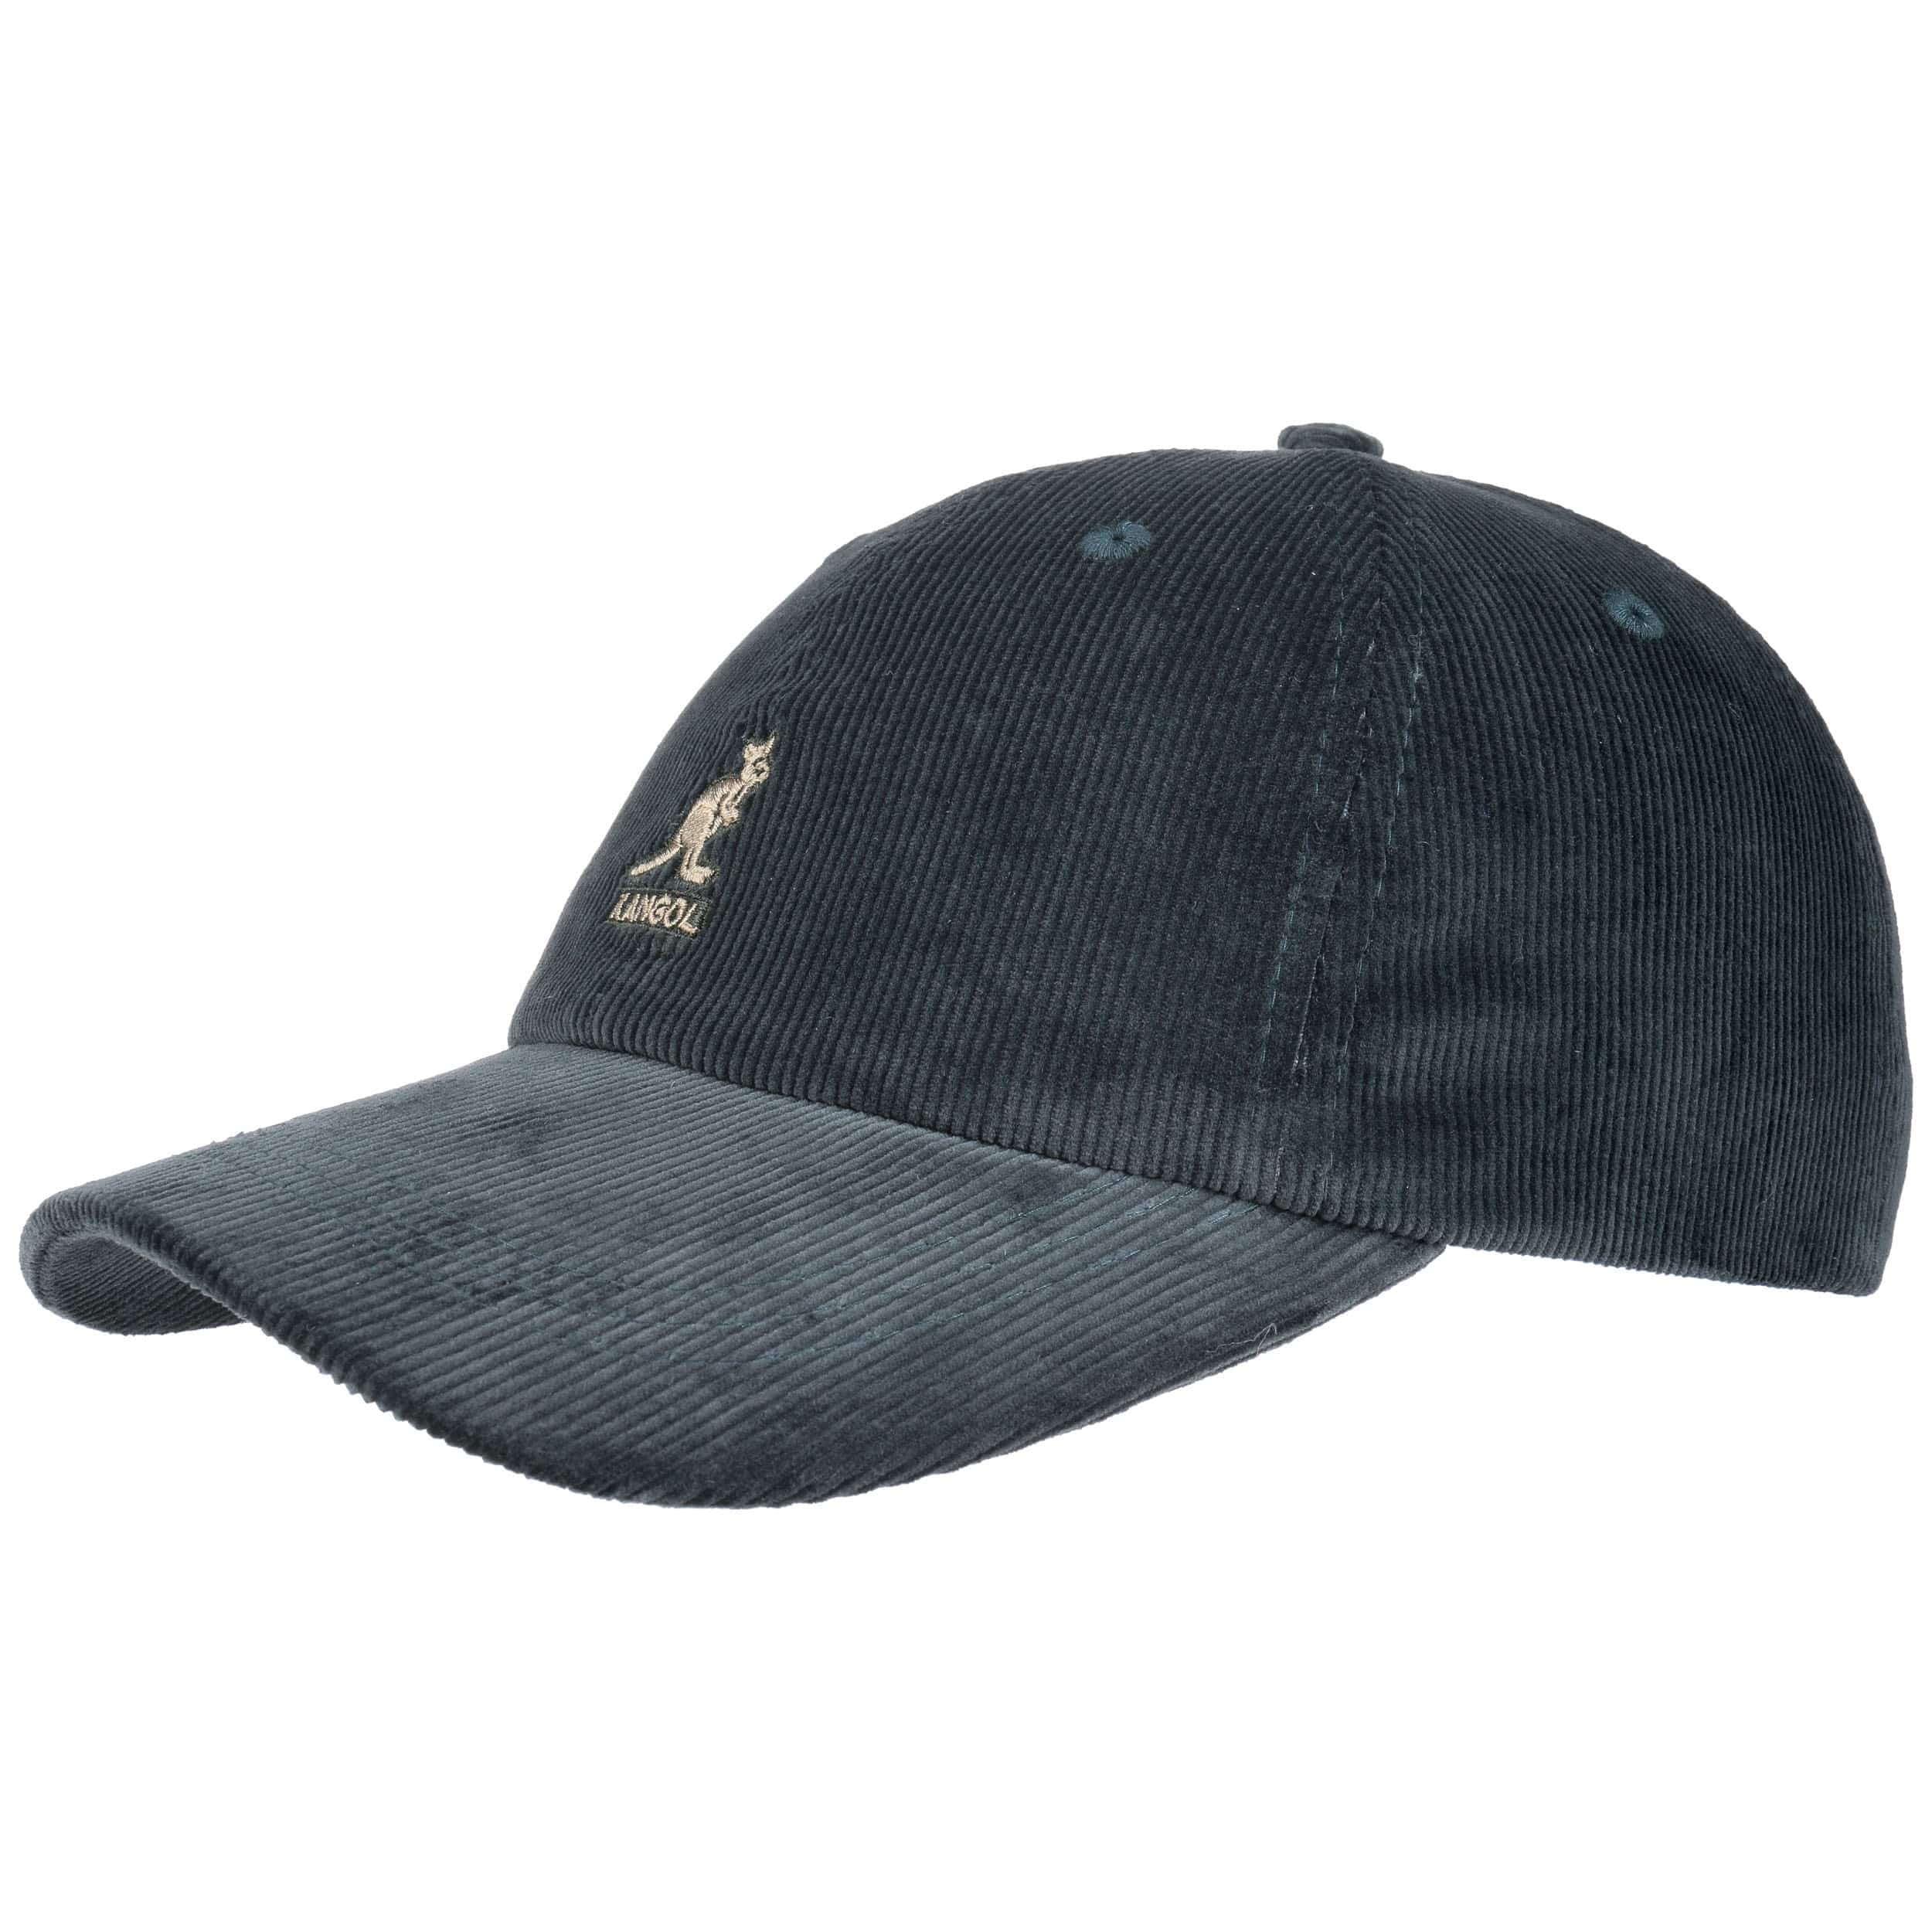 665792d0932 ... Classic Corduroy Baseball Cap by Kangol - dark green 5 ...